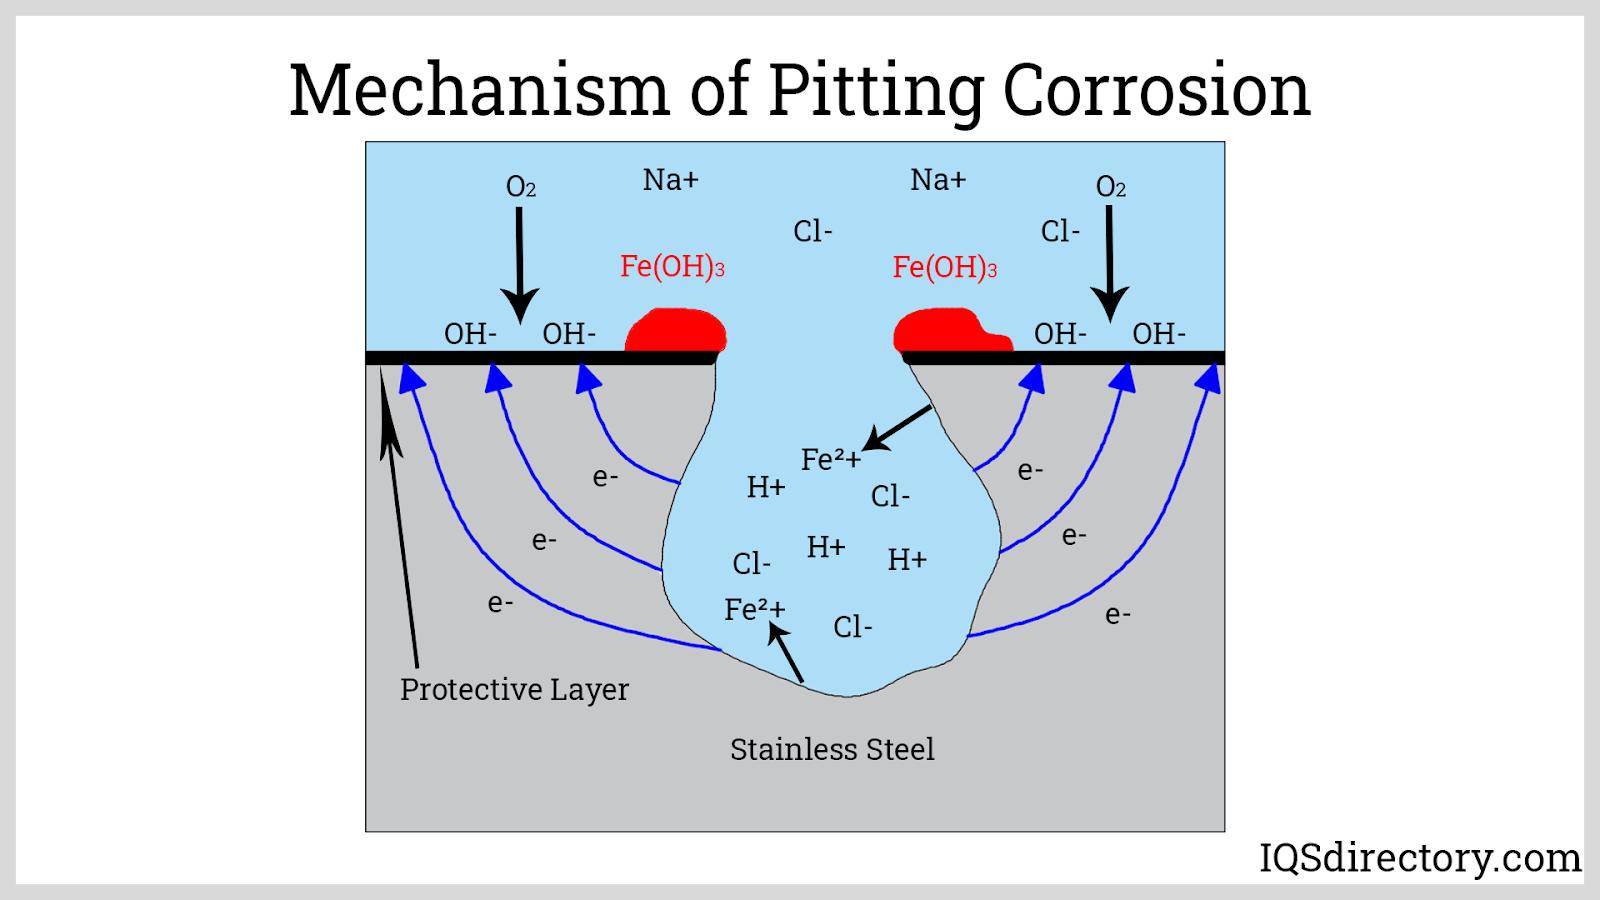 Mechanism of Pitting Corrosion